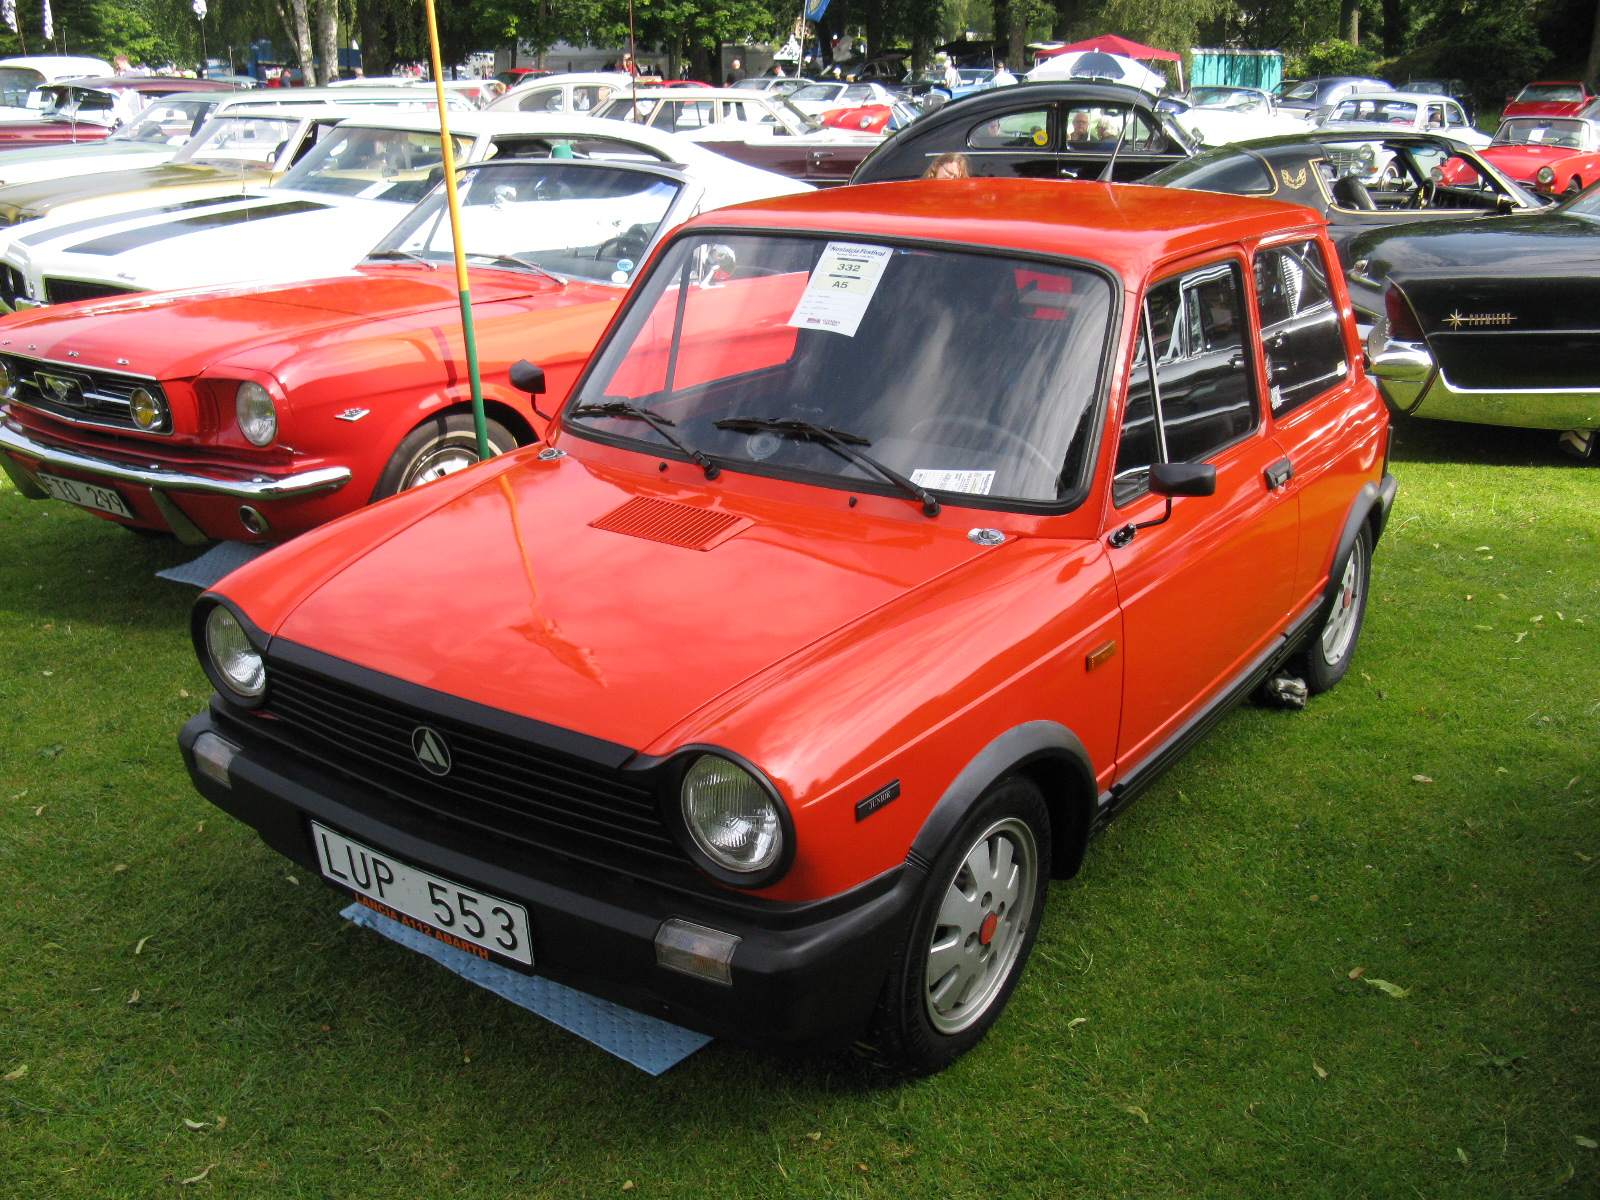 https://upload.wikimedia.org/wikipedia/commons/5/57/1984_Lancia_A112_Junior_%28nakhon100%29.jpg